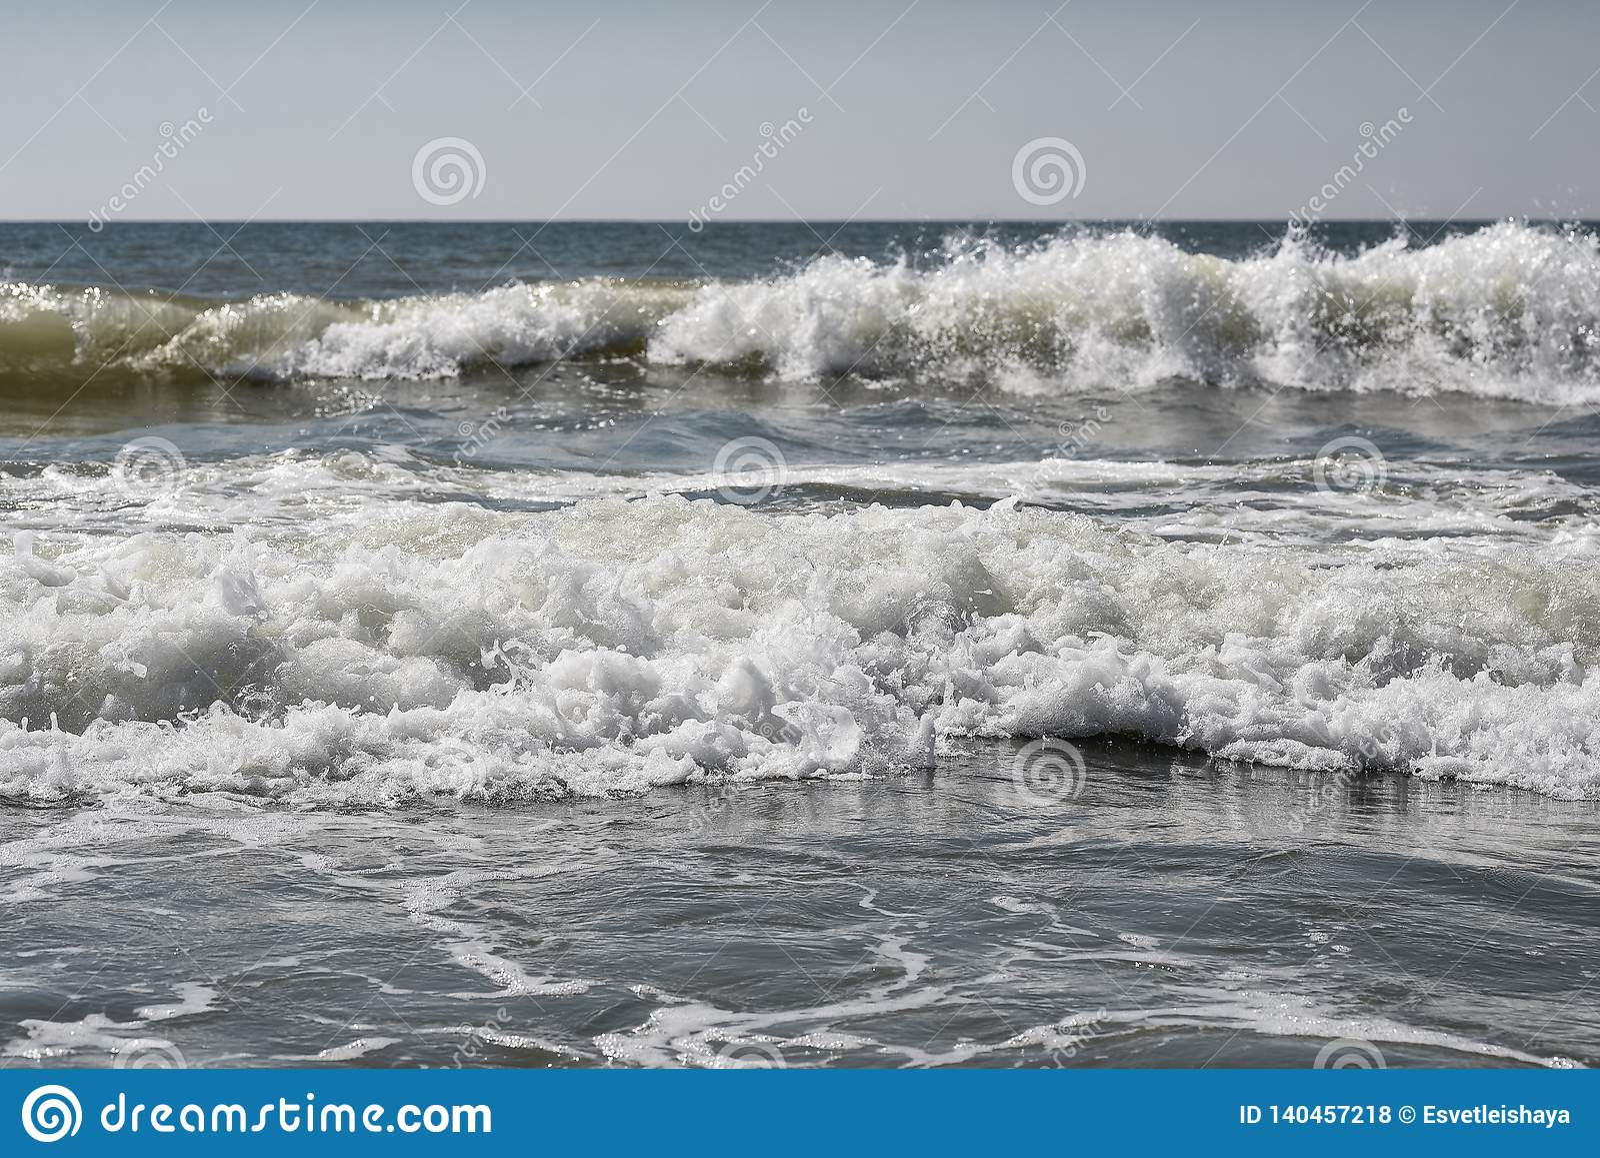 Overzees, zand, hemel, golven en de zomerdag Mooi Tropisch Strand Mooi strand en tropische overzees Zeekust